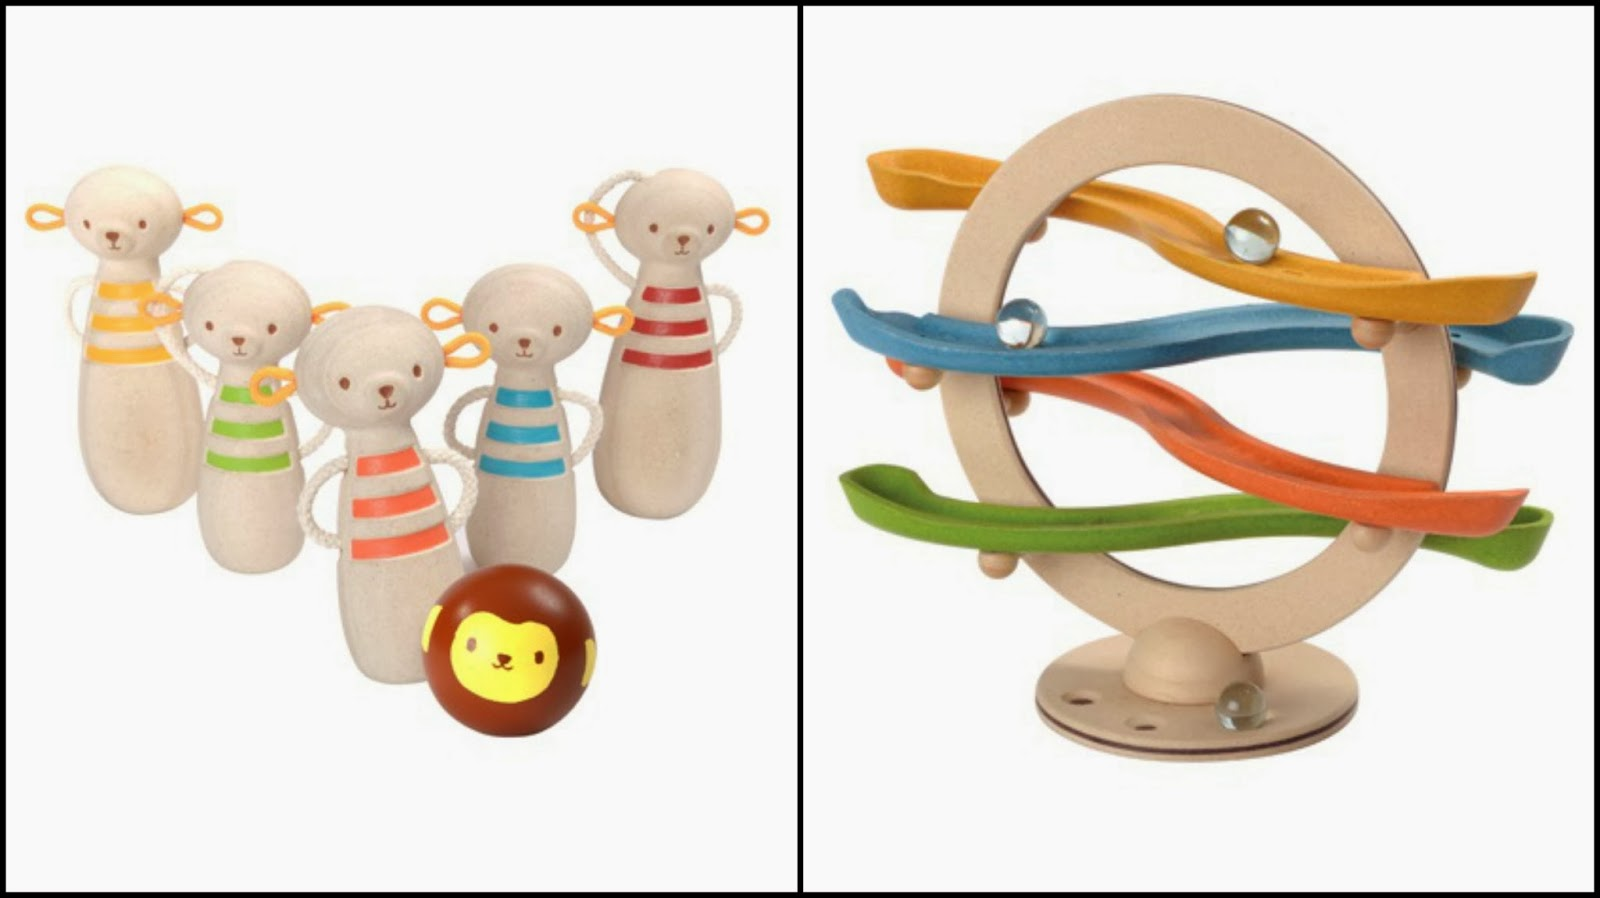 PlanToys wooden toys